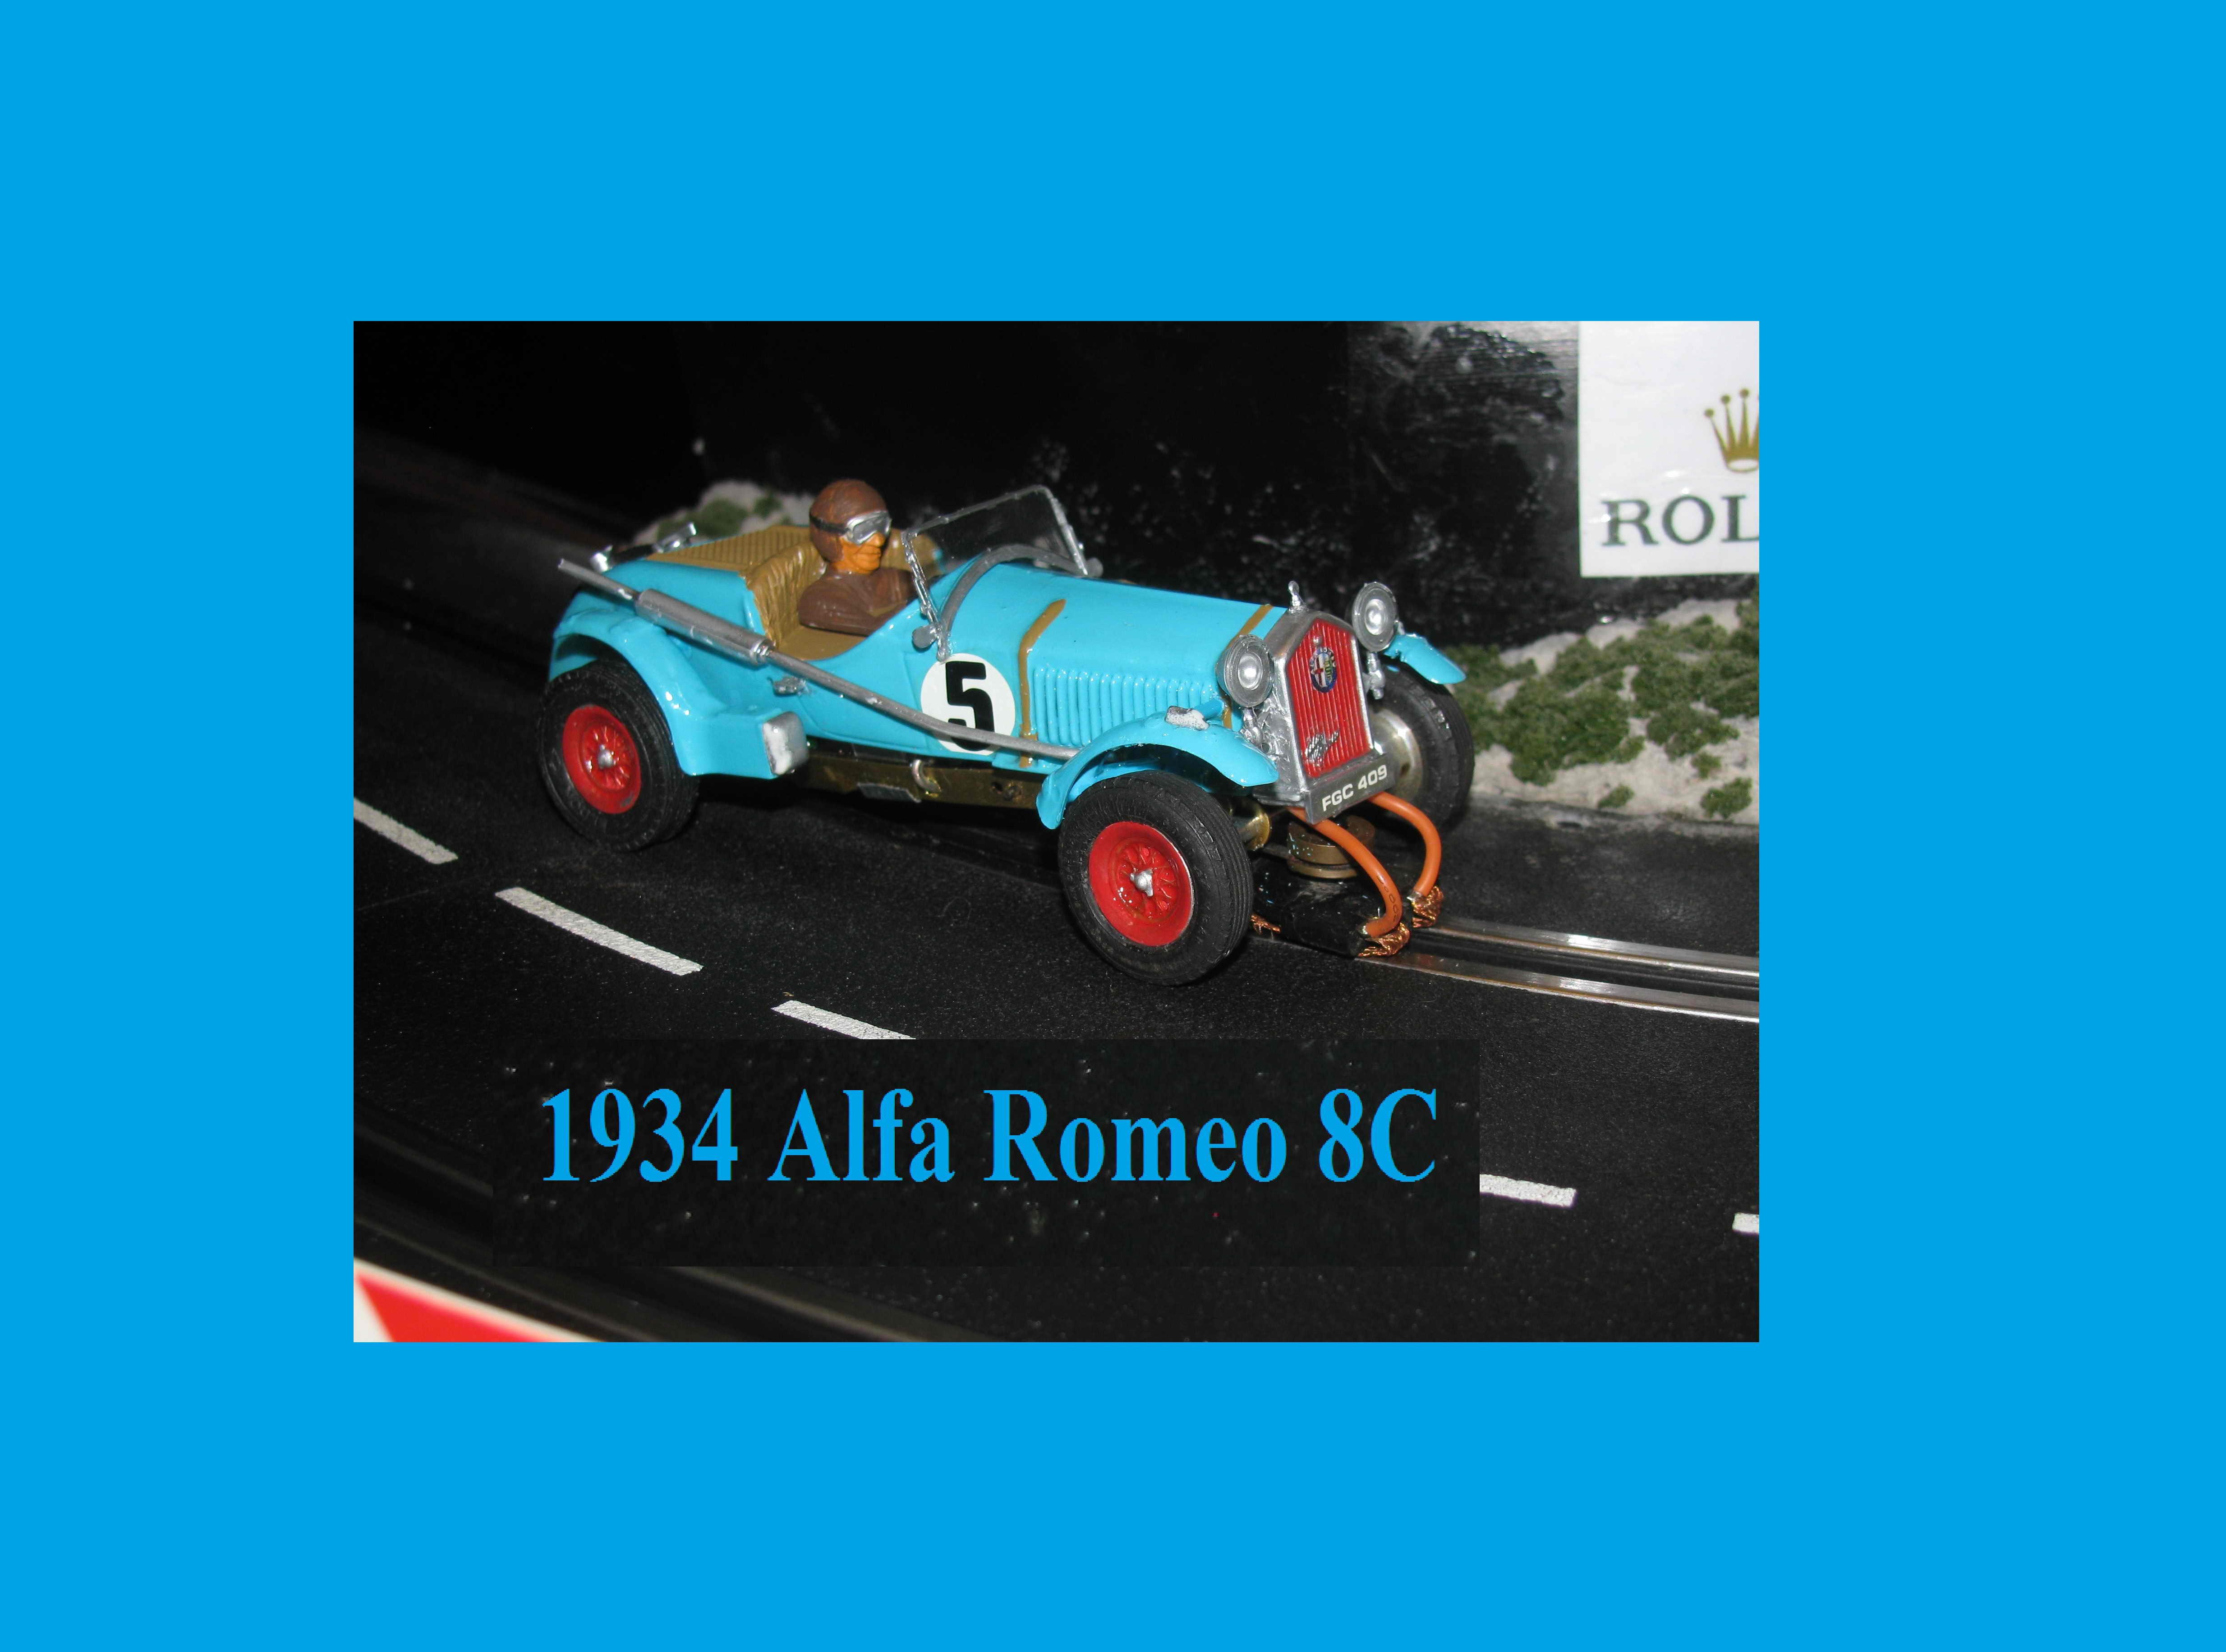 MPC 1934 Alfa Romeo 8C blue  Slot Car in 1/32 Scale